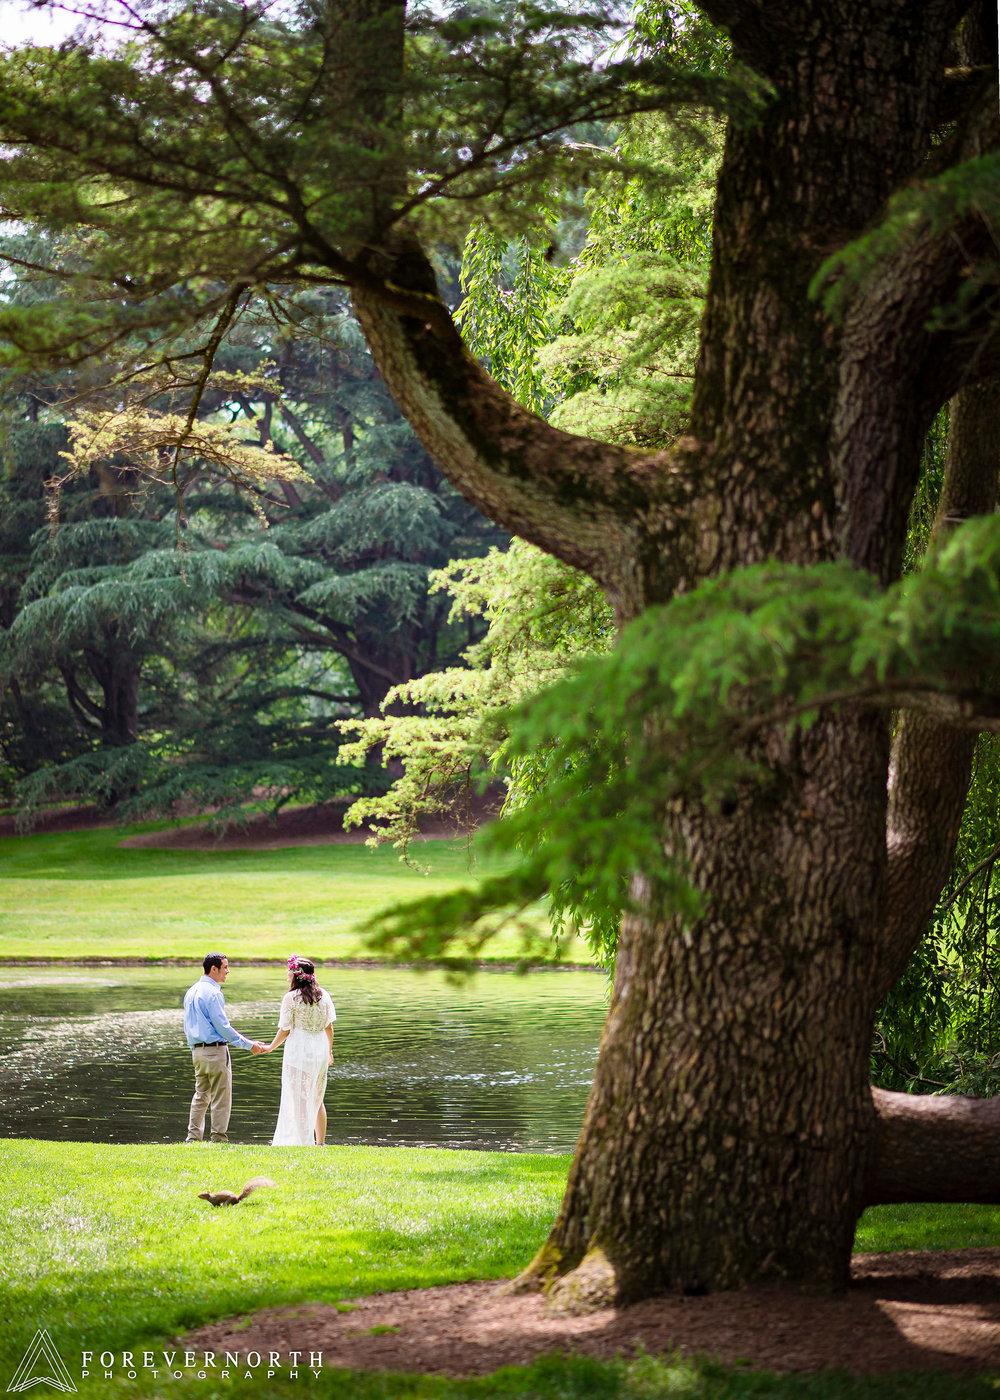 Longwood-Gardens-Engagement-Photos-02.JPG